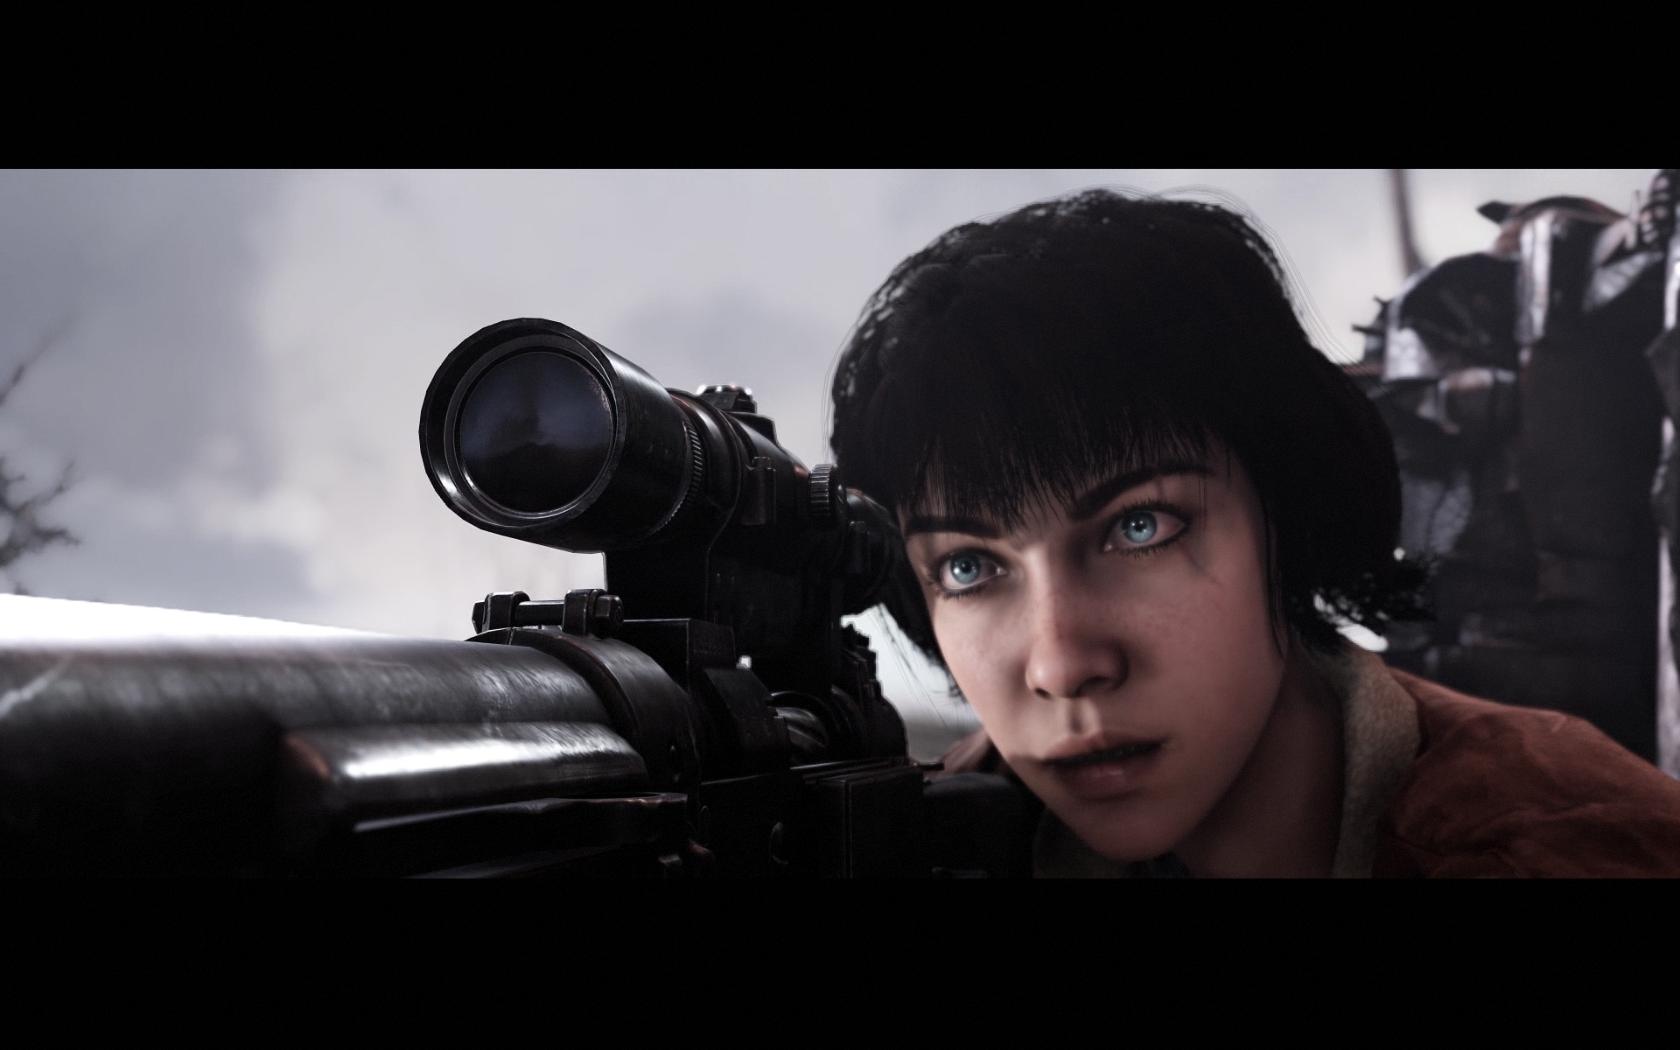 Wolfenstein  Youngblood Screenshot 2019.07.27 - 05.15.22.04.png